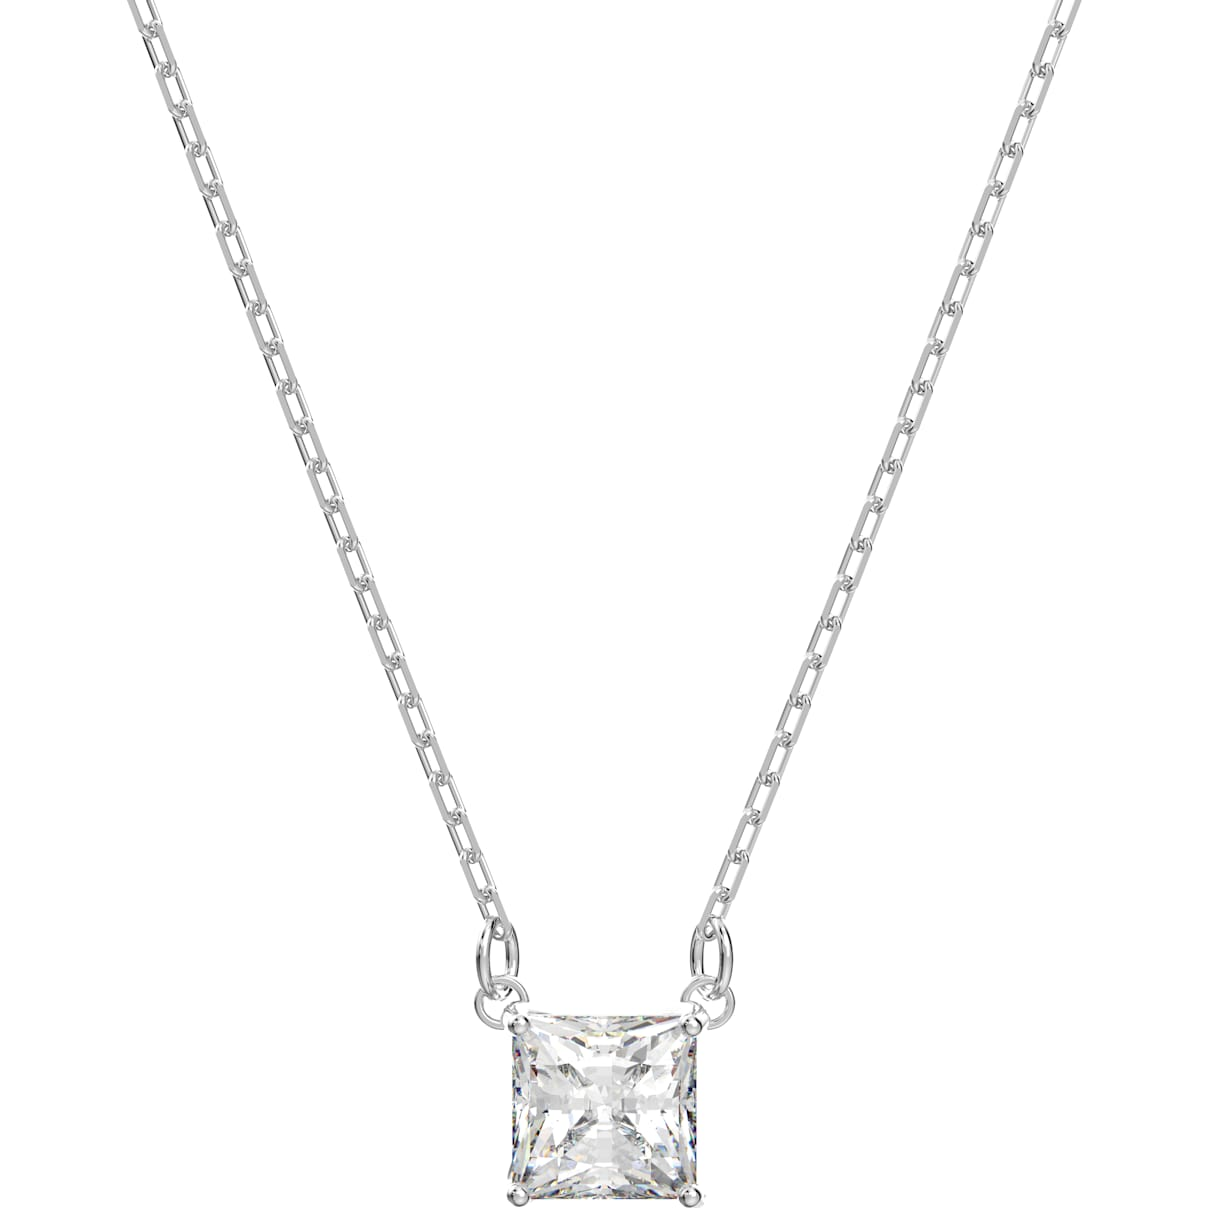 Swarovski Attract Necklace, White, Rhodium plated